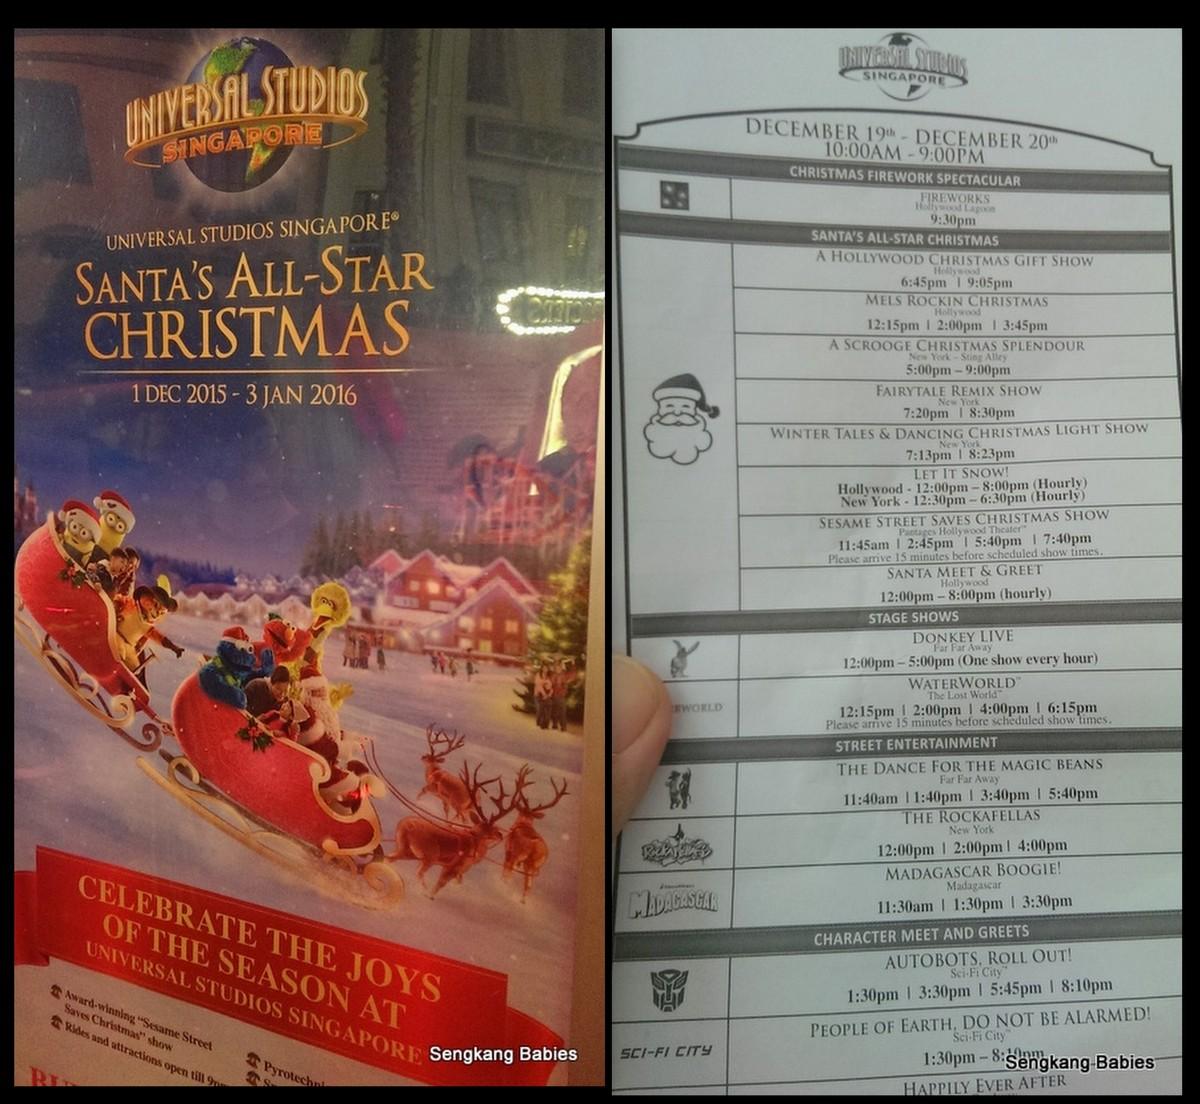 santa's All stars Christmas